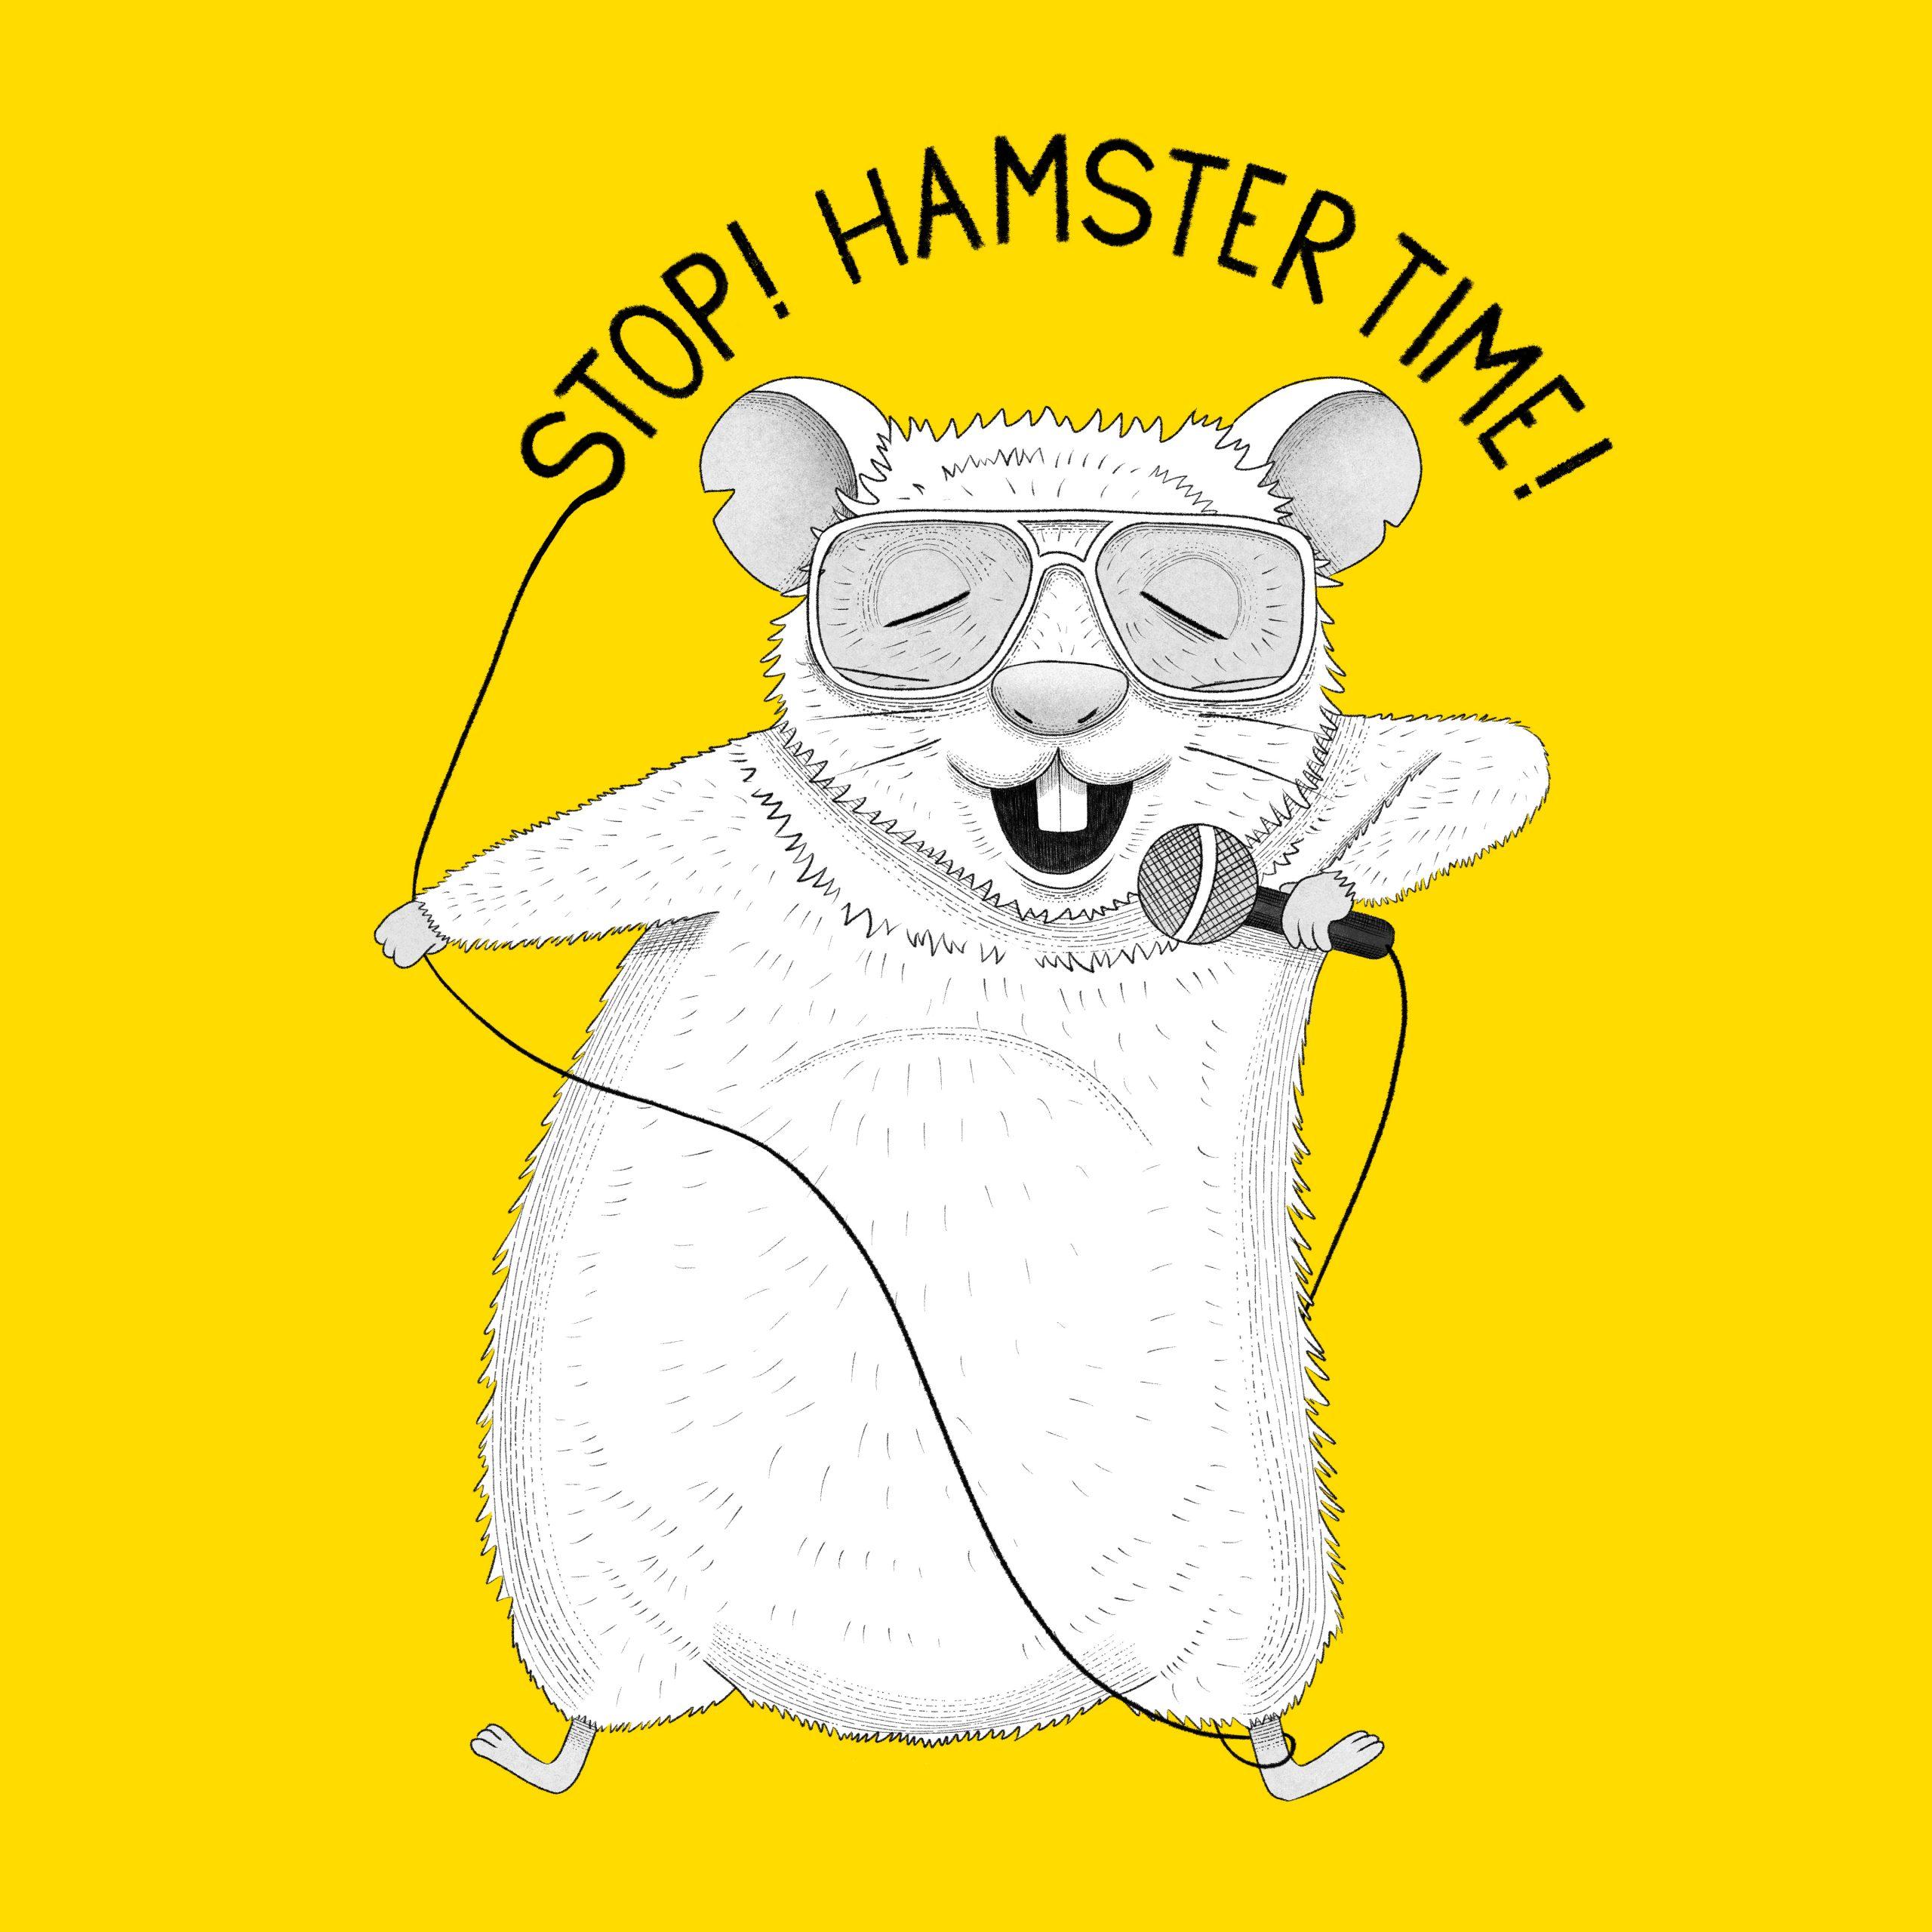 Hamster singing MC Hammer Animal Karaoke illustration by drawingeggen